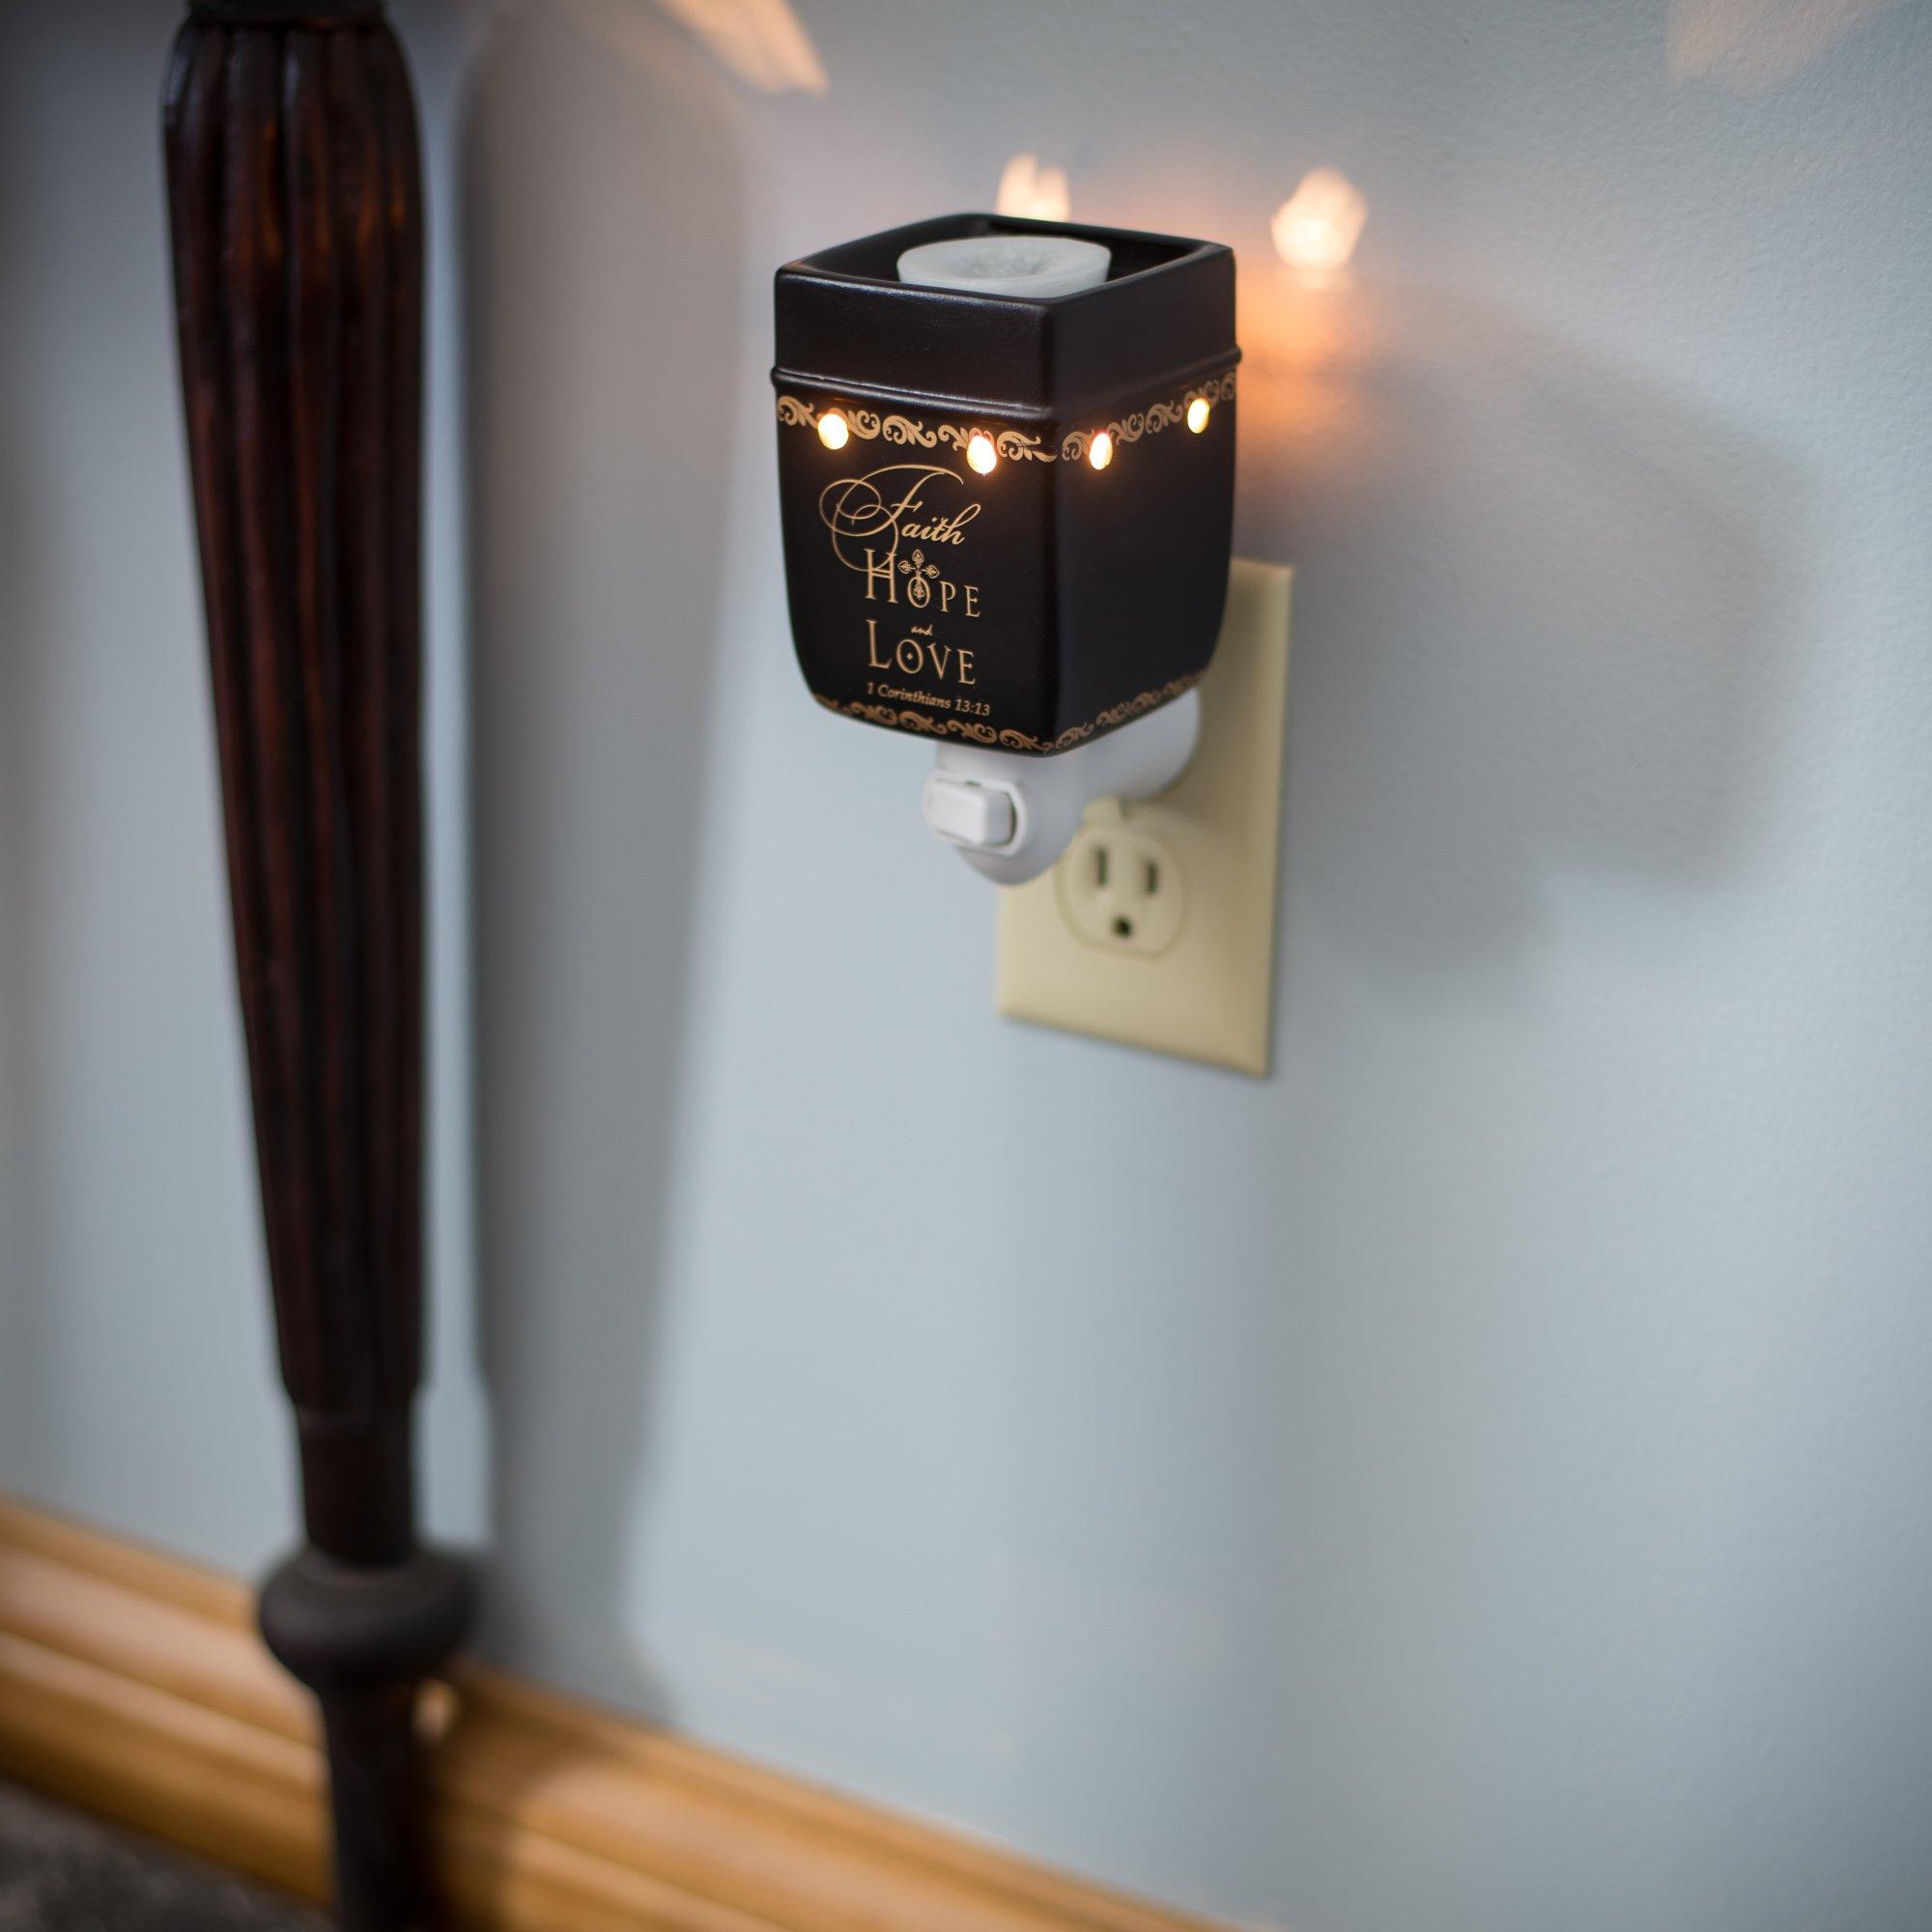 Elanze Designs Faith Hope Love 1 Corinthians 13:13 Ceramic Stoneware Plug-in Outlet Wax Oil Warmer by Elanze Designs (Image #4)